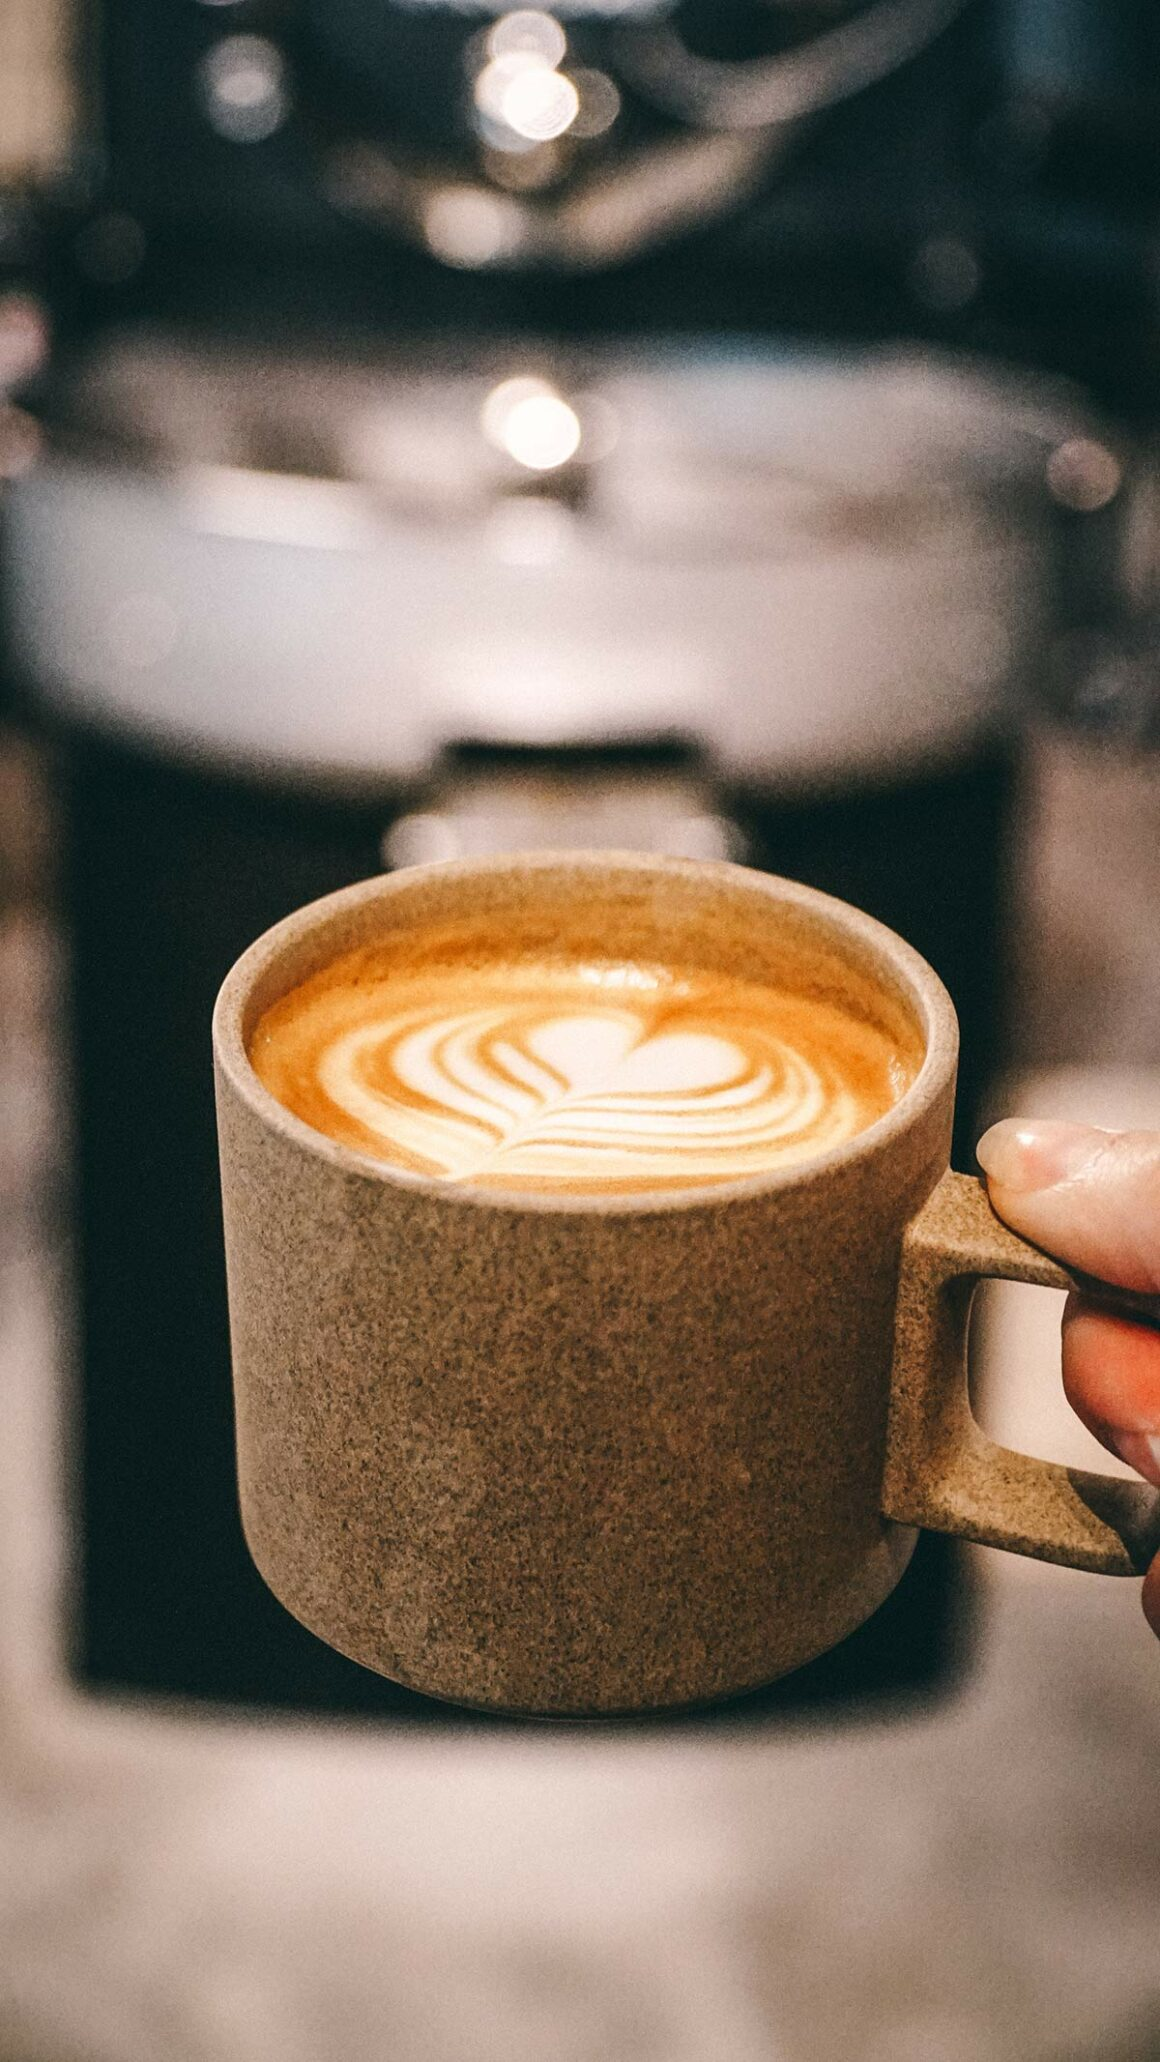 kaffeekapseln nachhaltig